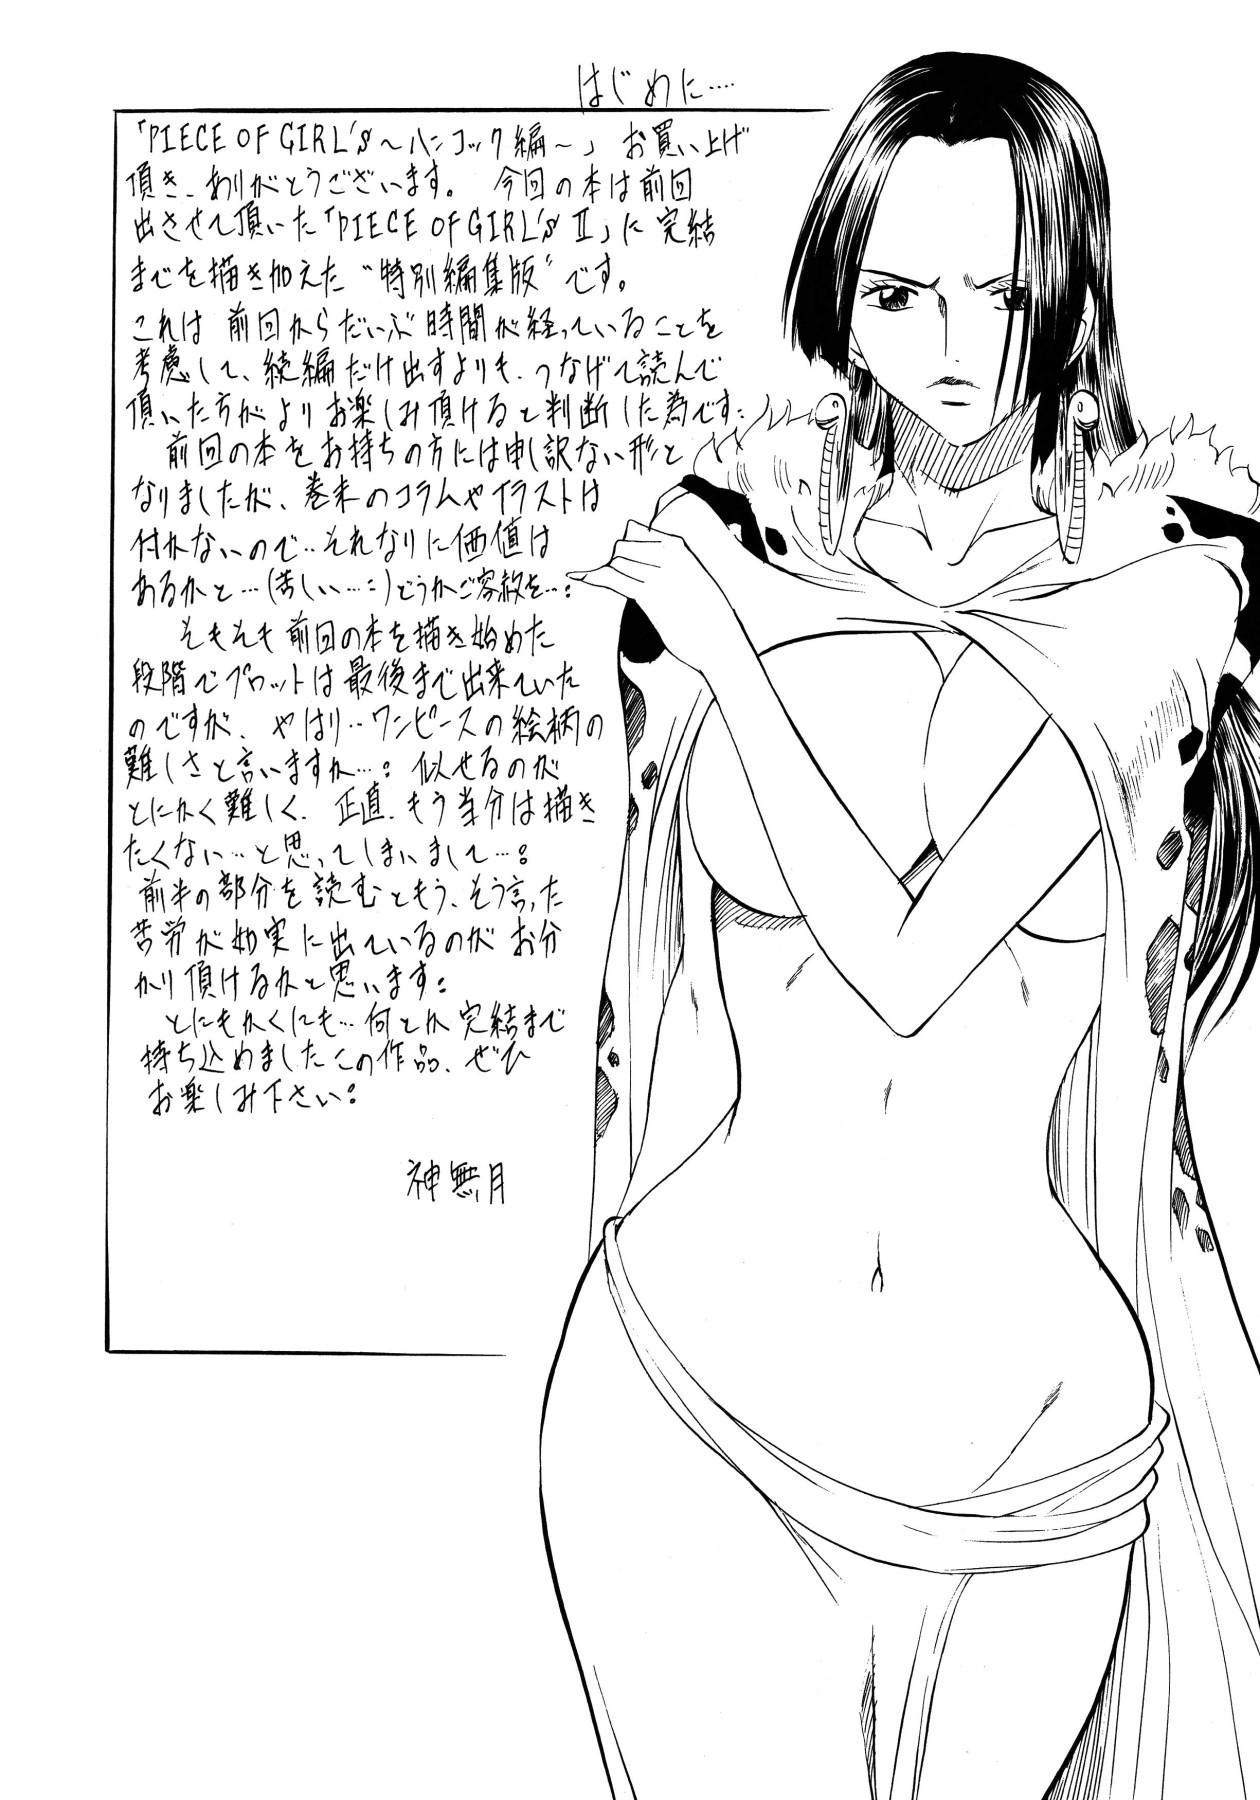 "[Busou Megami (Kannaduki Kanna)] Busou Megami Archives Series 1 ""Piece of Girl's ~Hancock Hen~"" (One Piece) [English] {Doujins.com} 2"